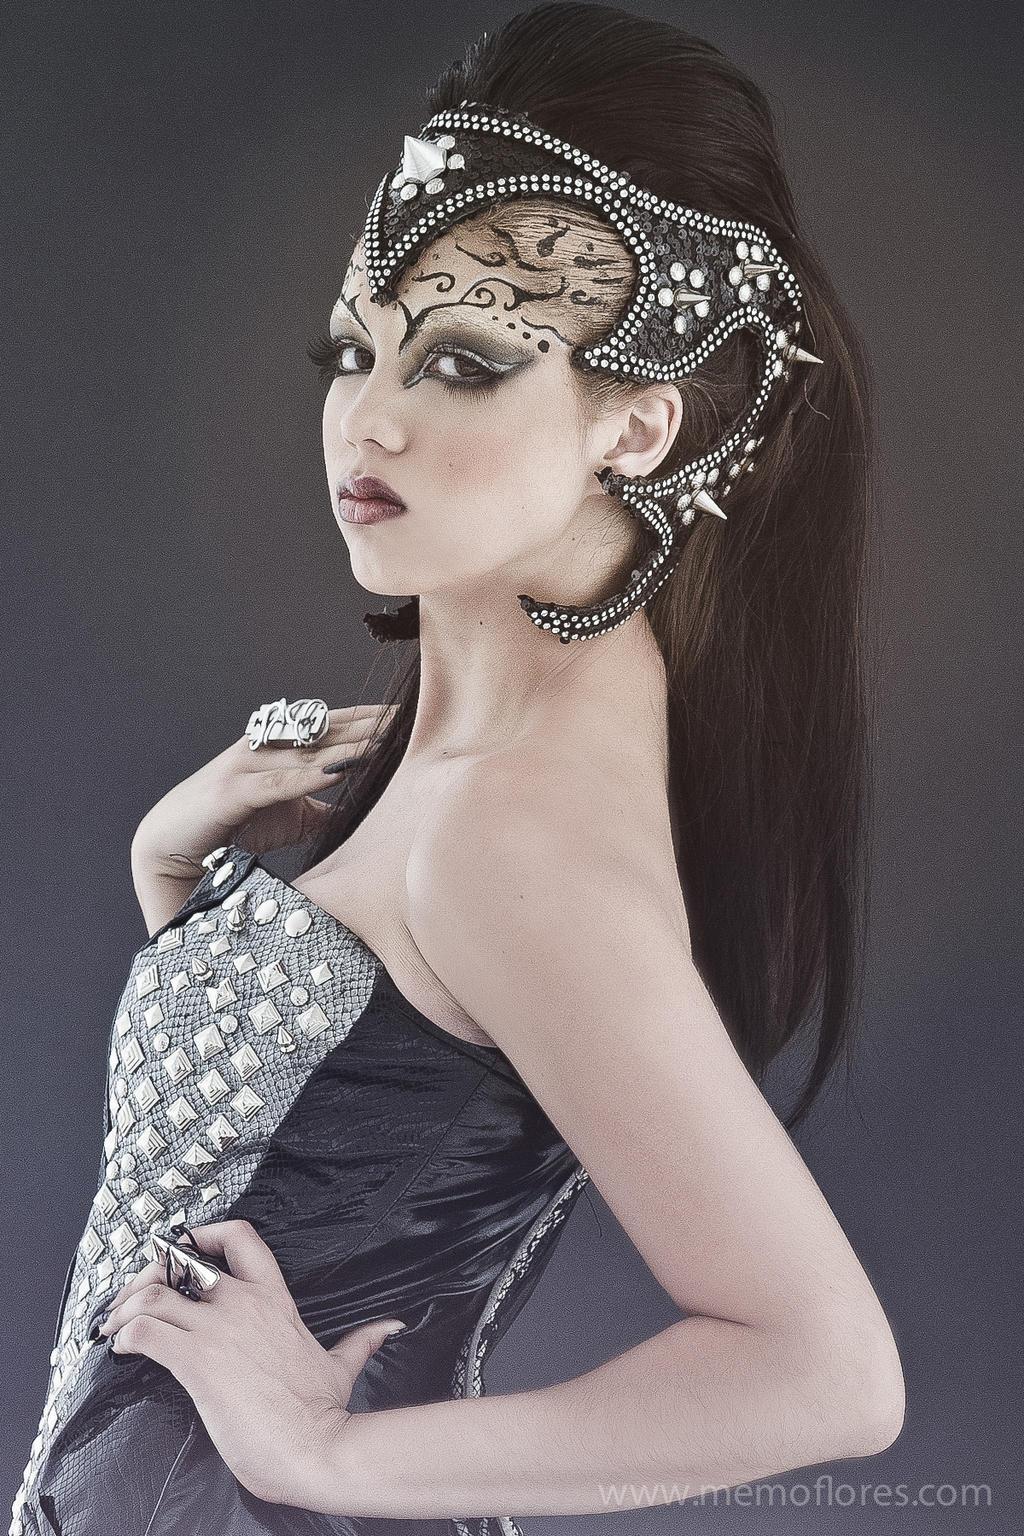 maquillaje de fantasia by memo06dic